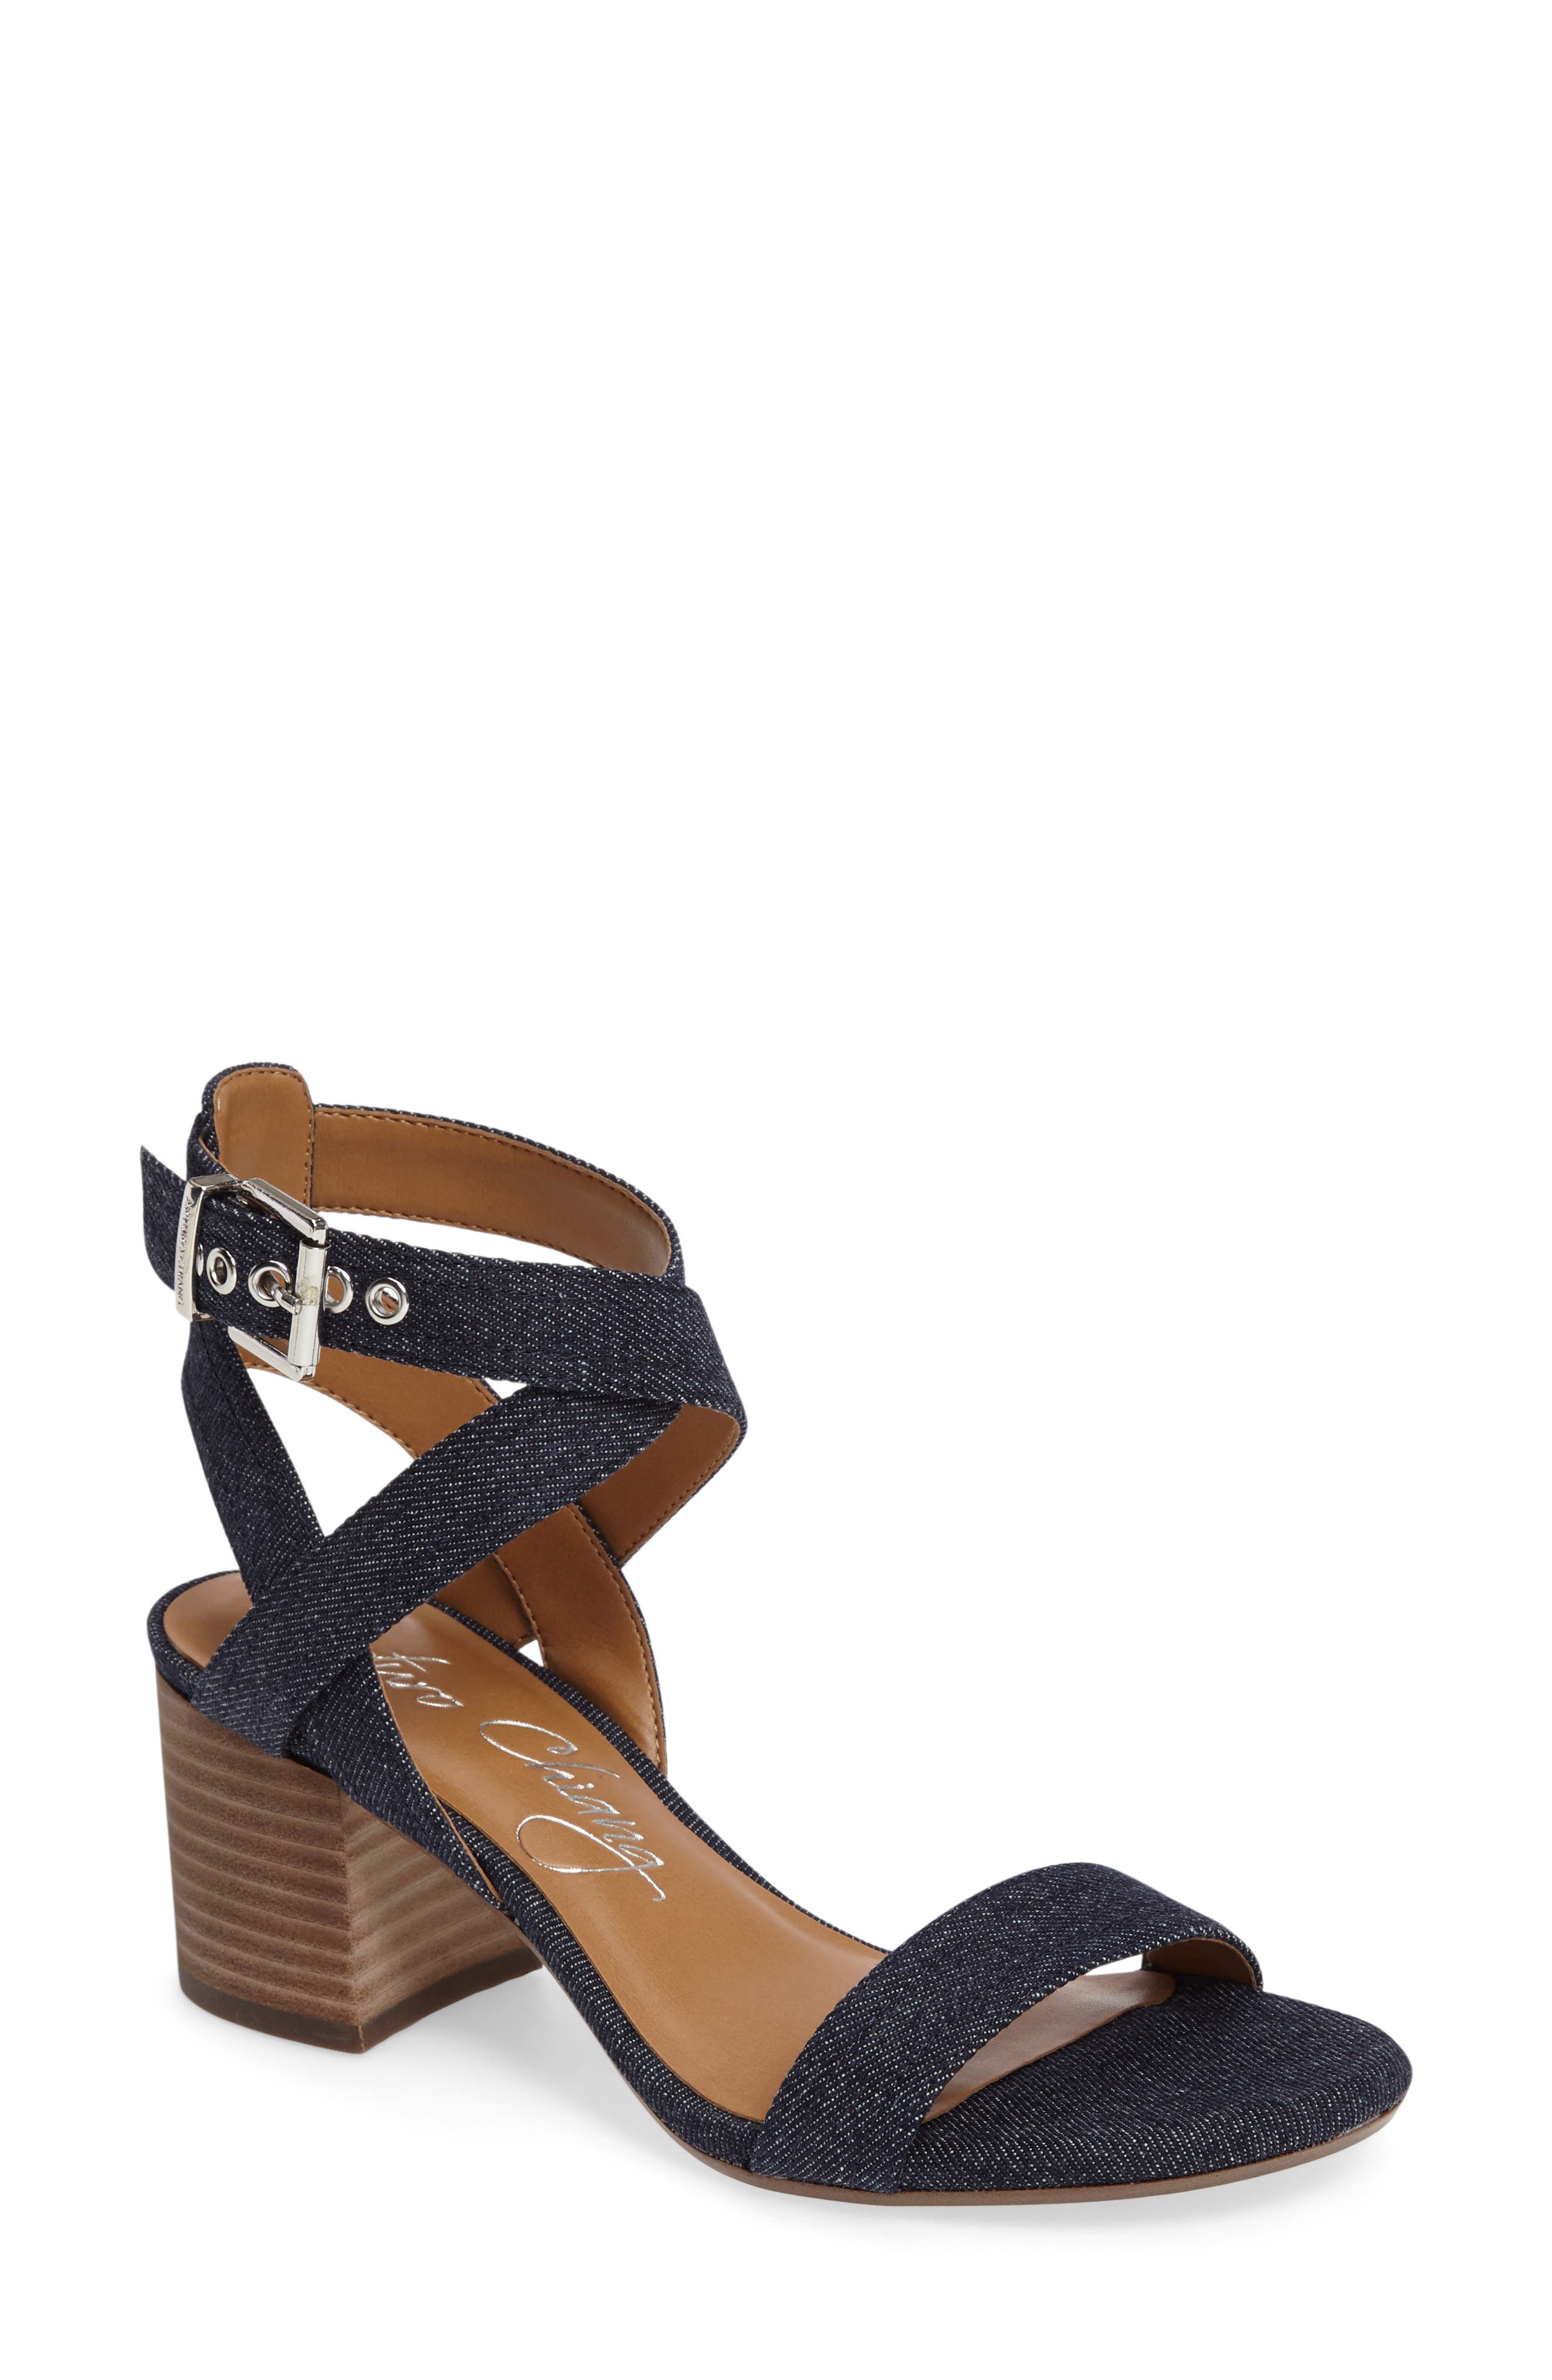 Main Image - Arturo Chiang Hammil Block Heel Sandal (Women)